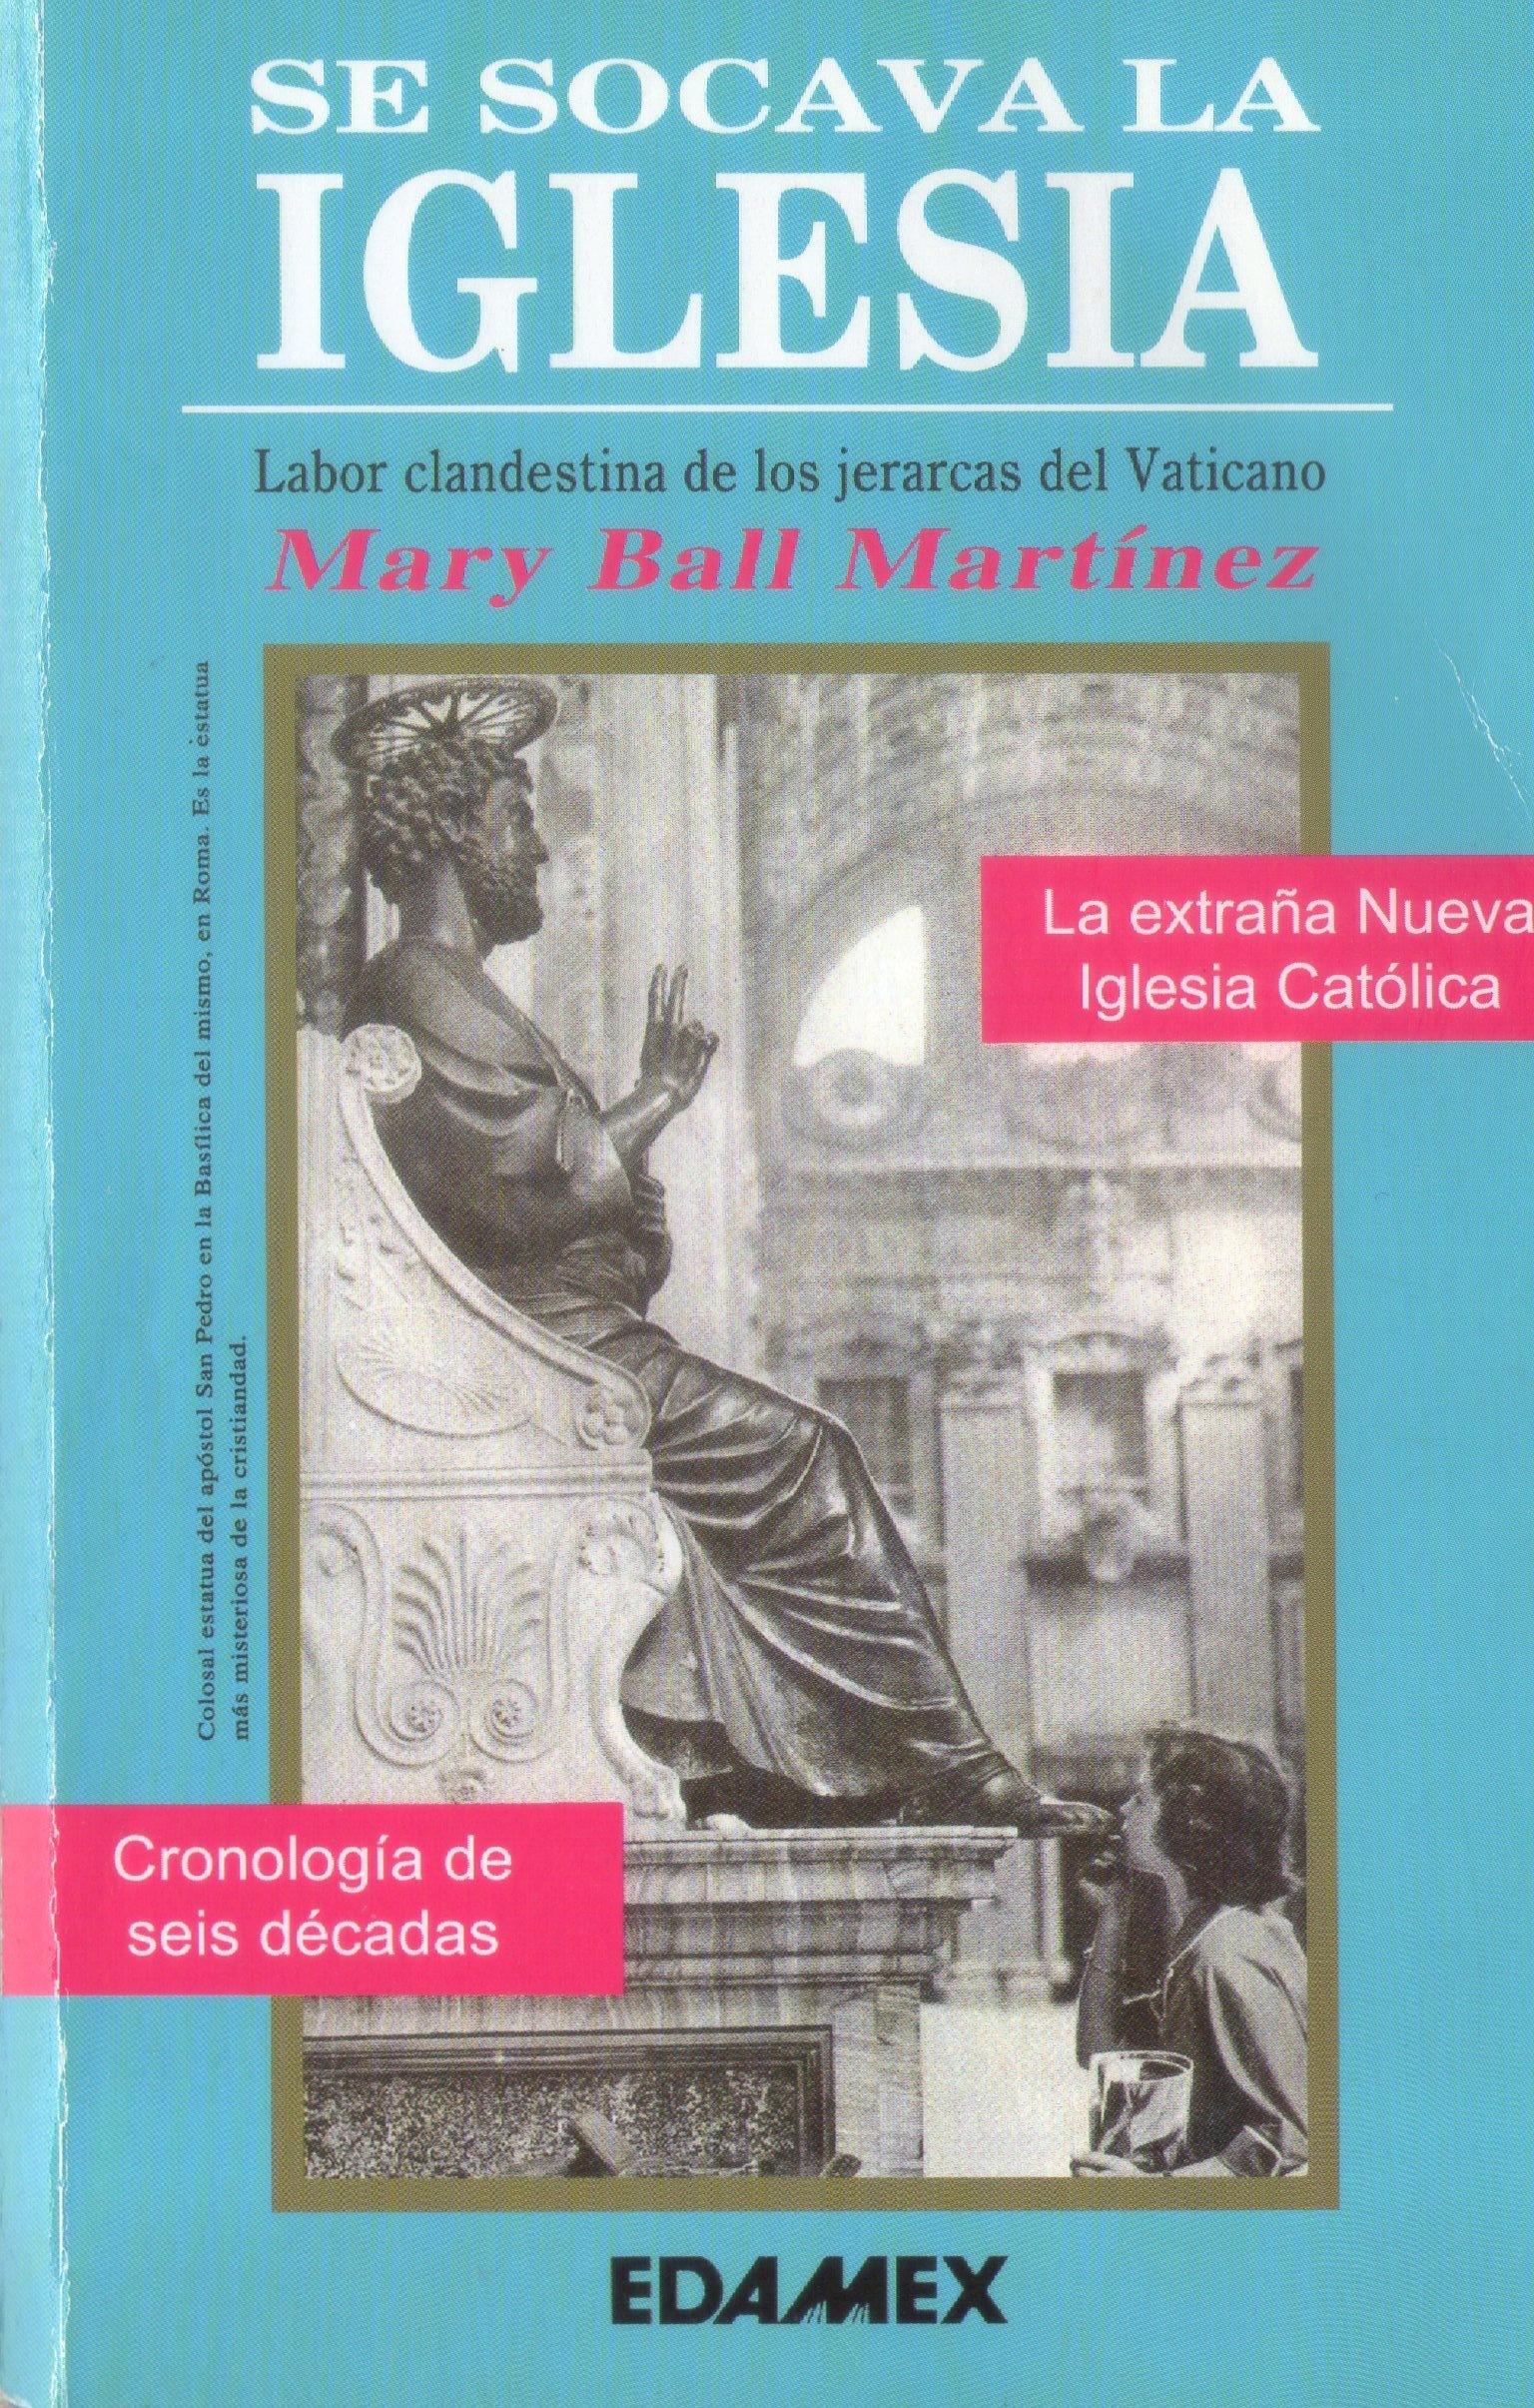 MARY BALL SE SOCAVA LA IGLESIA